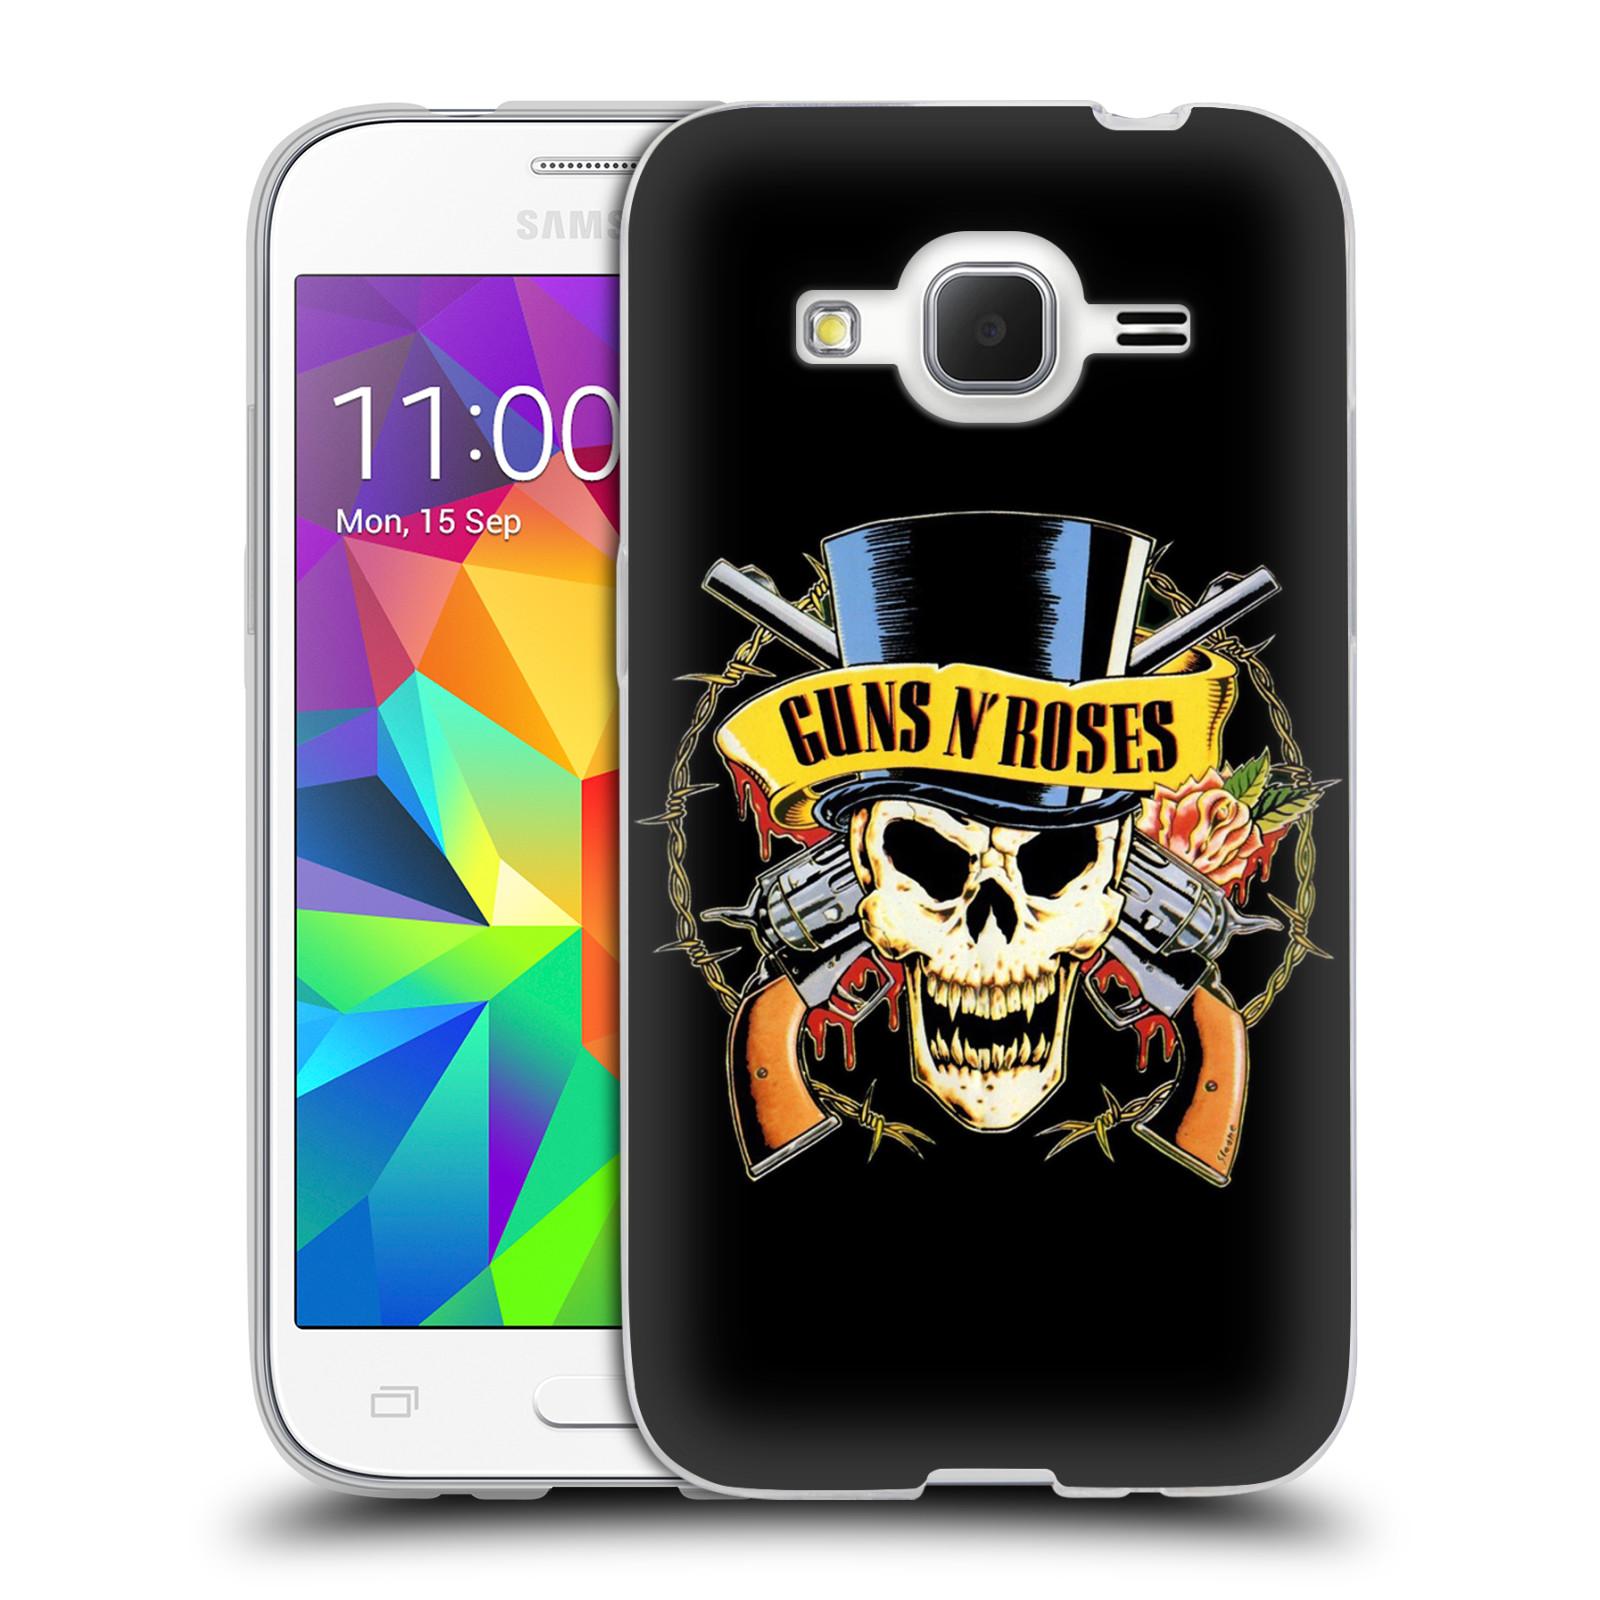 Silikonové pouzdro na mobil Samsung Galaxy Core Prime LTE HEAD CASE Guns N' Roses - Lebka